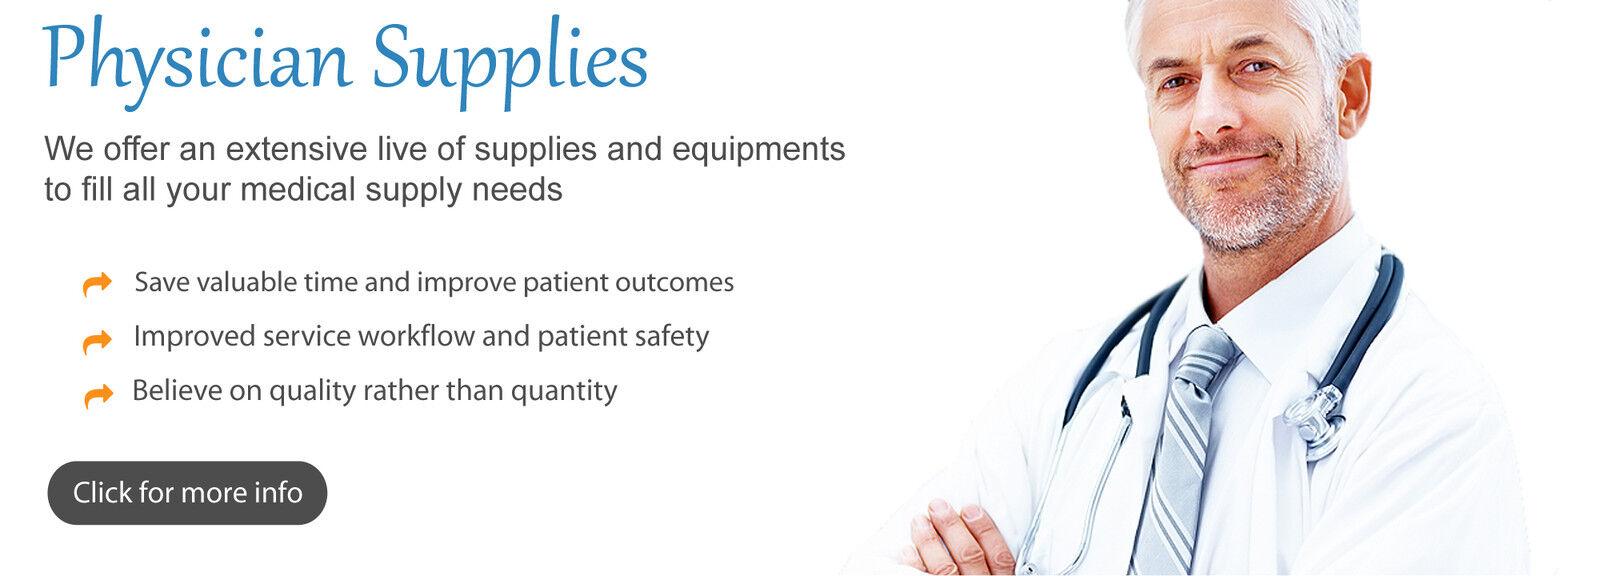 Sidra Medical Supply